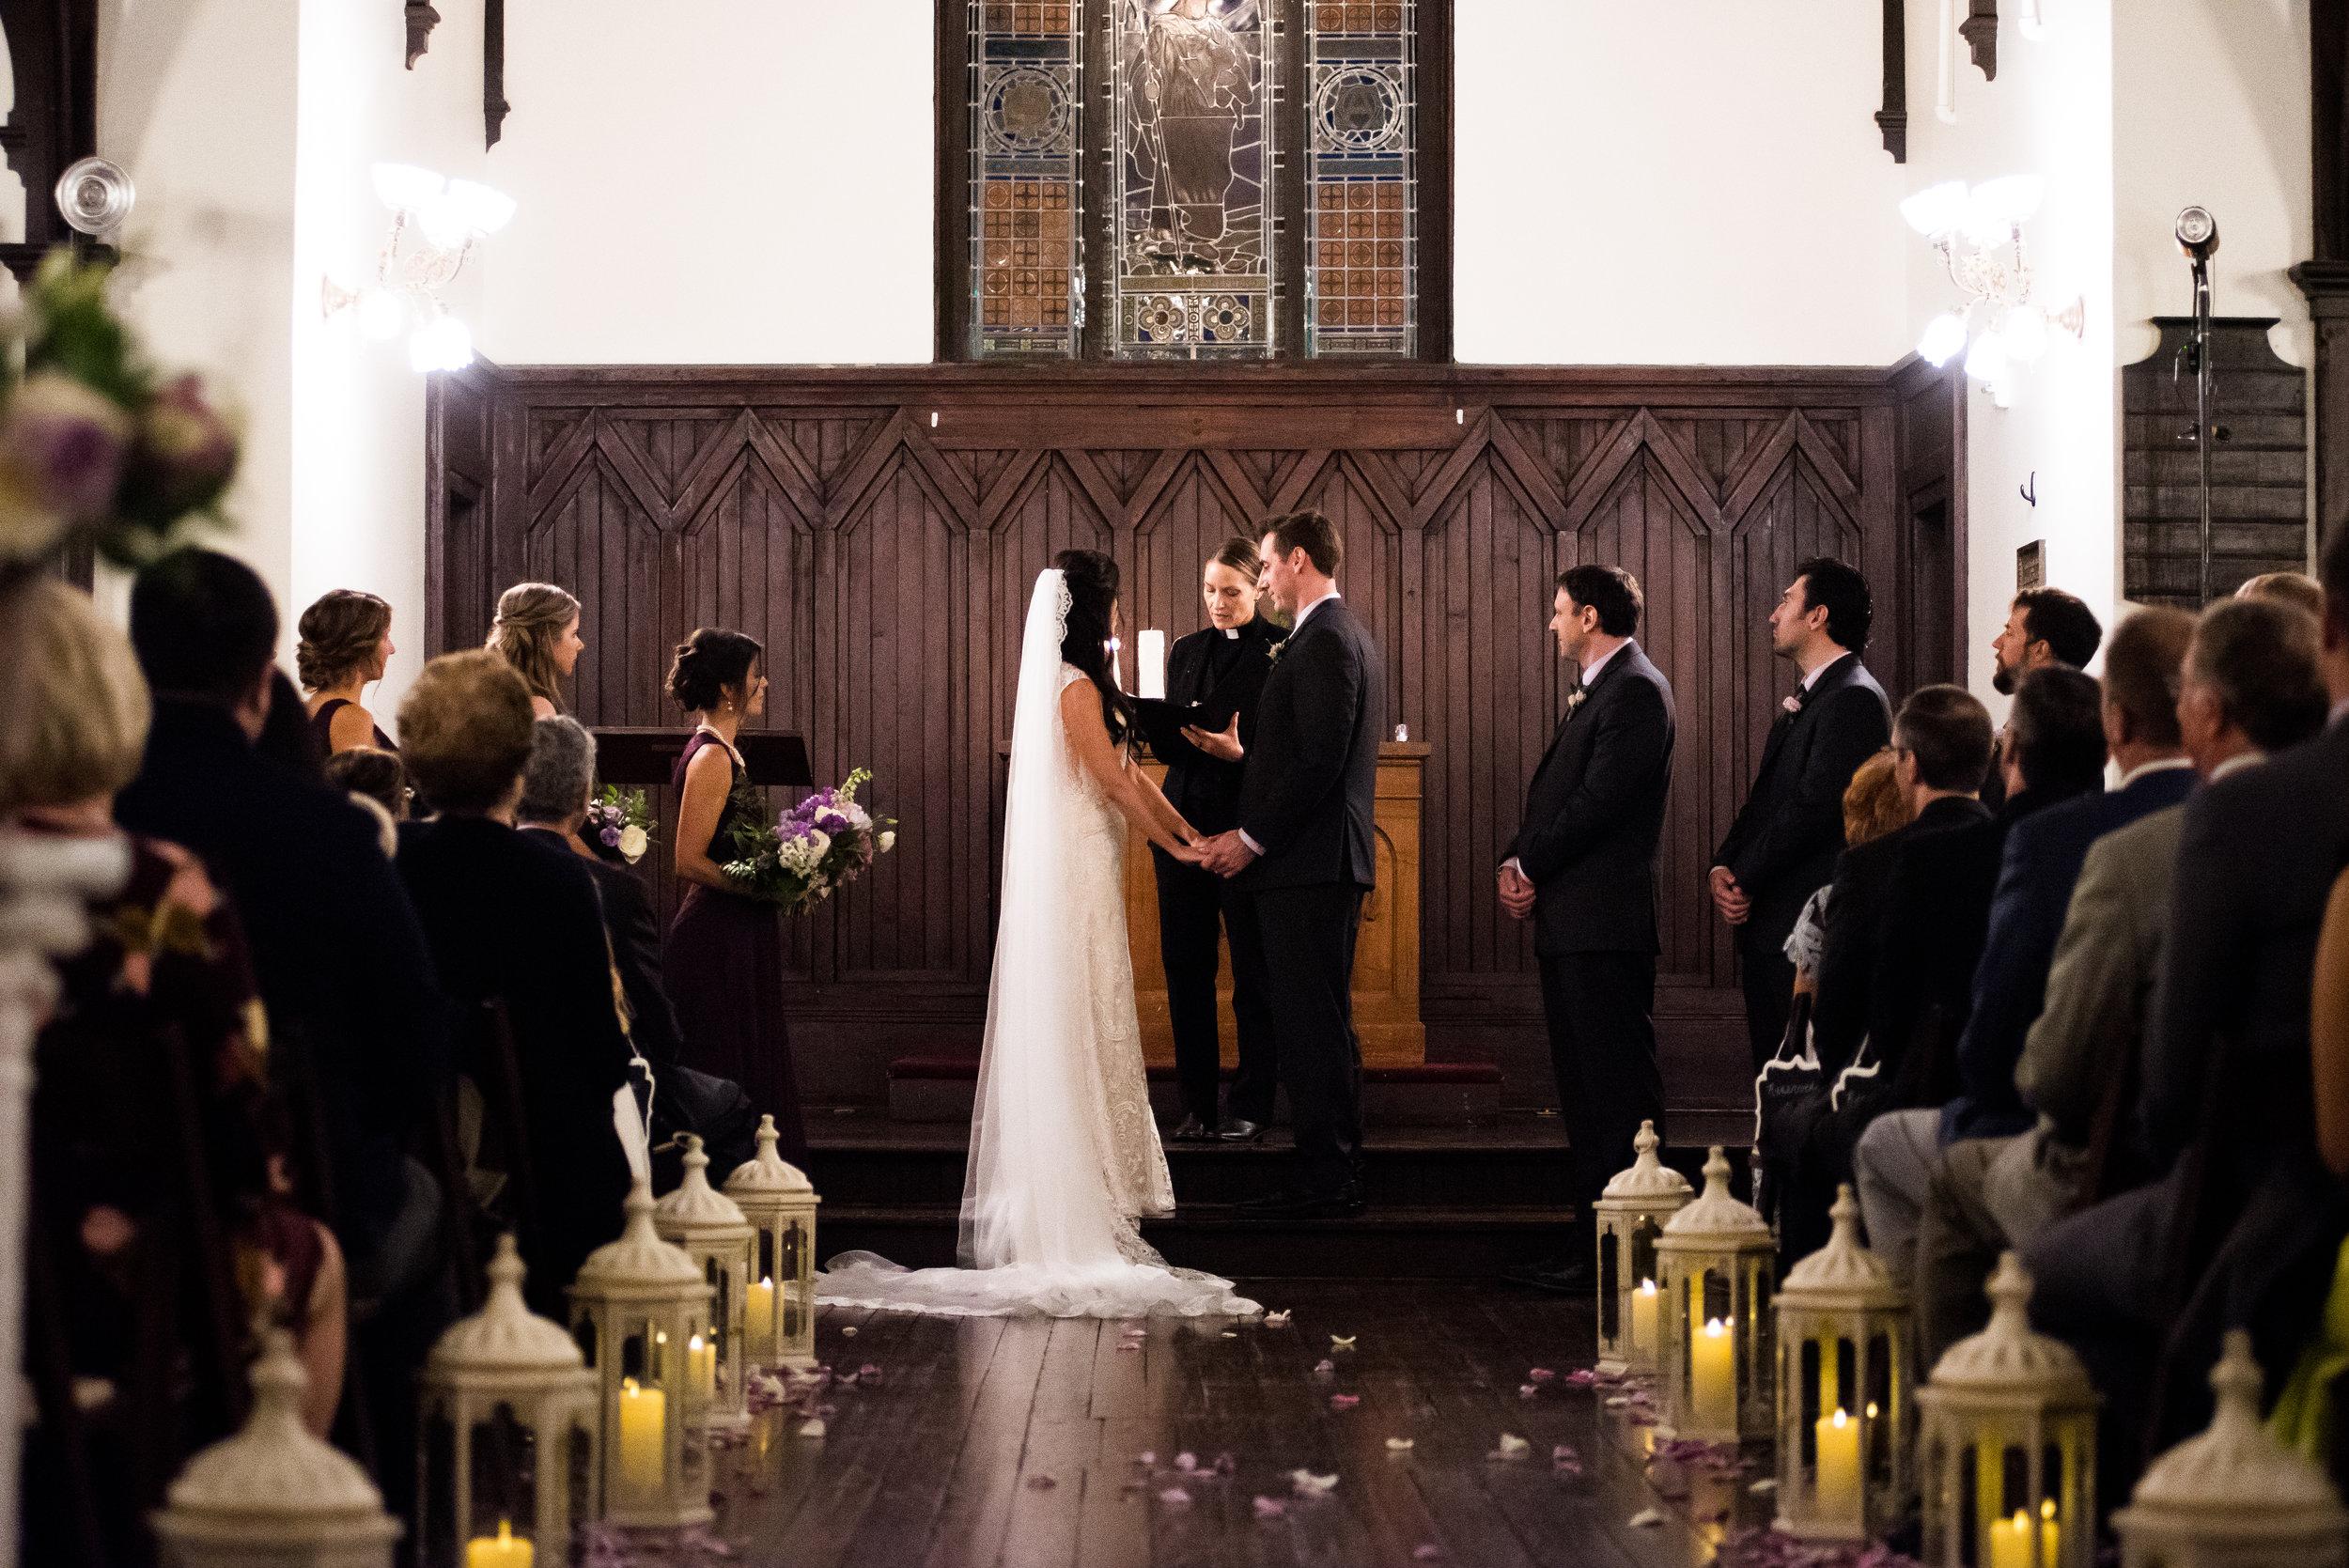 Heather & Lincoln Groves Wedding SP WEB_46.jpg